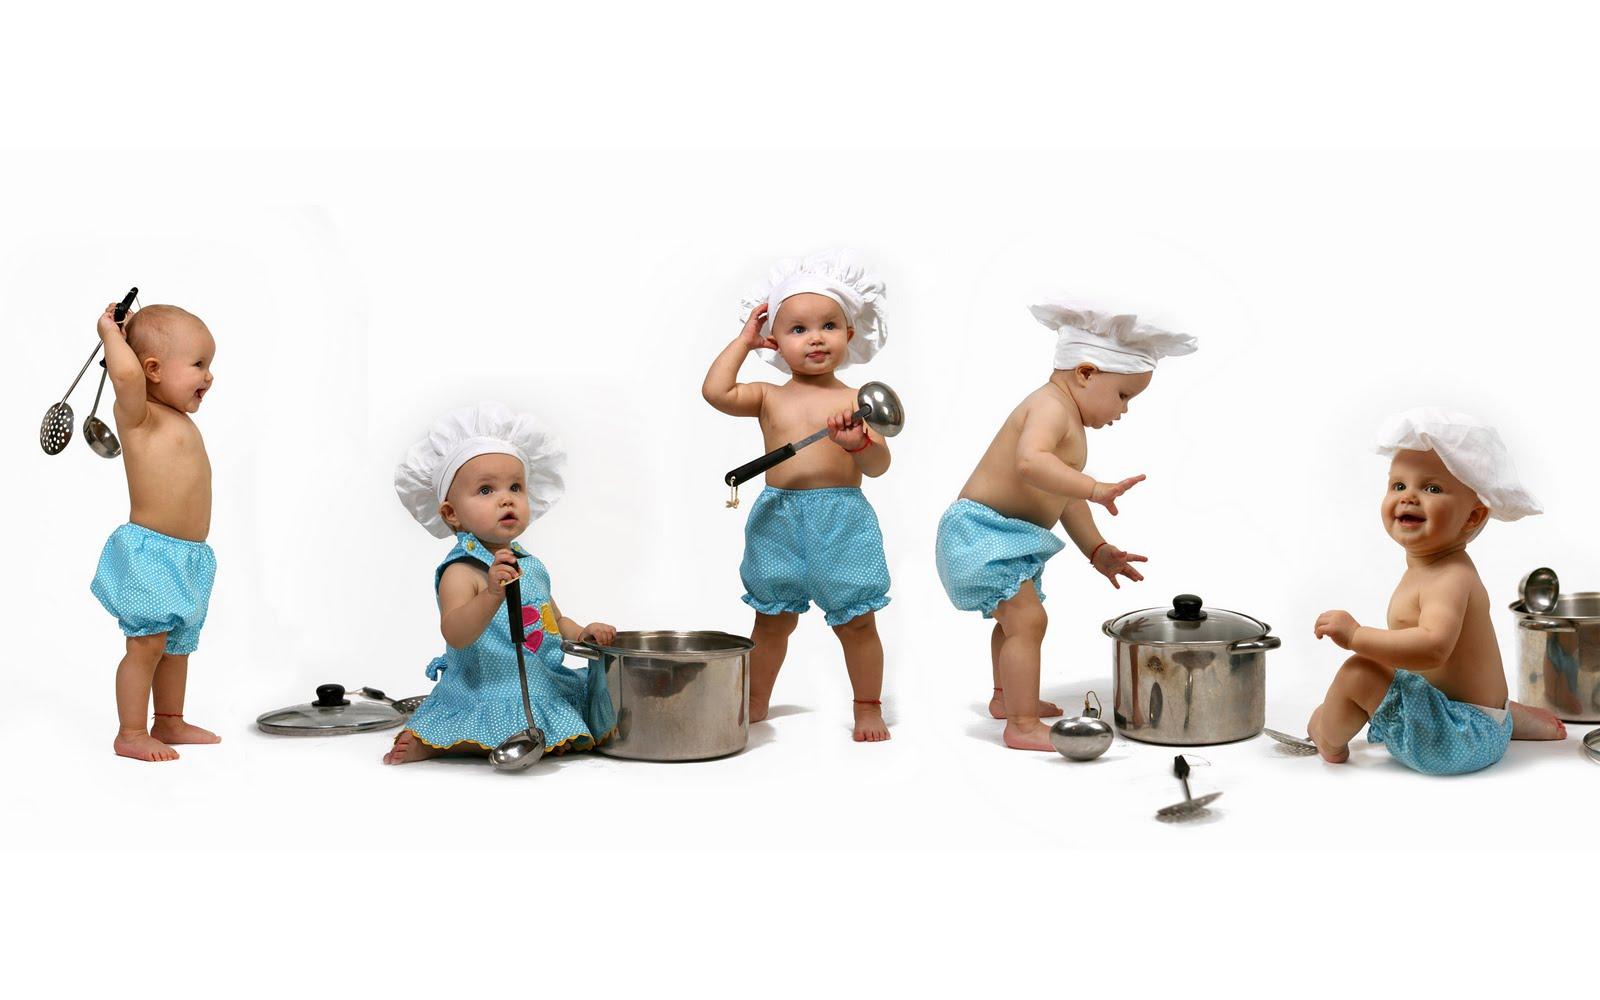 Funny Baby Desktop Wallpaper Photo